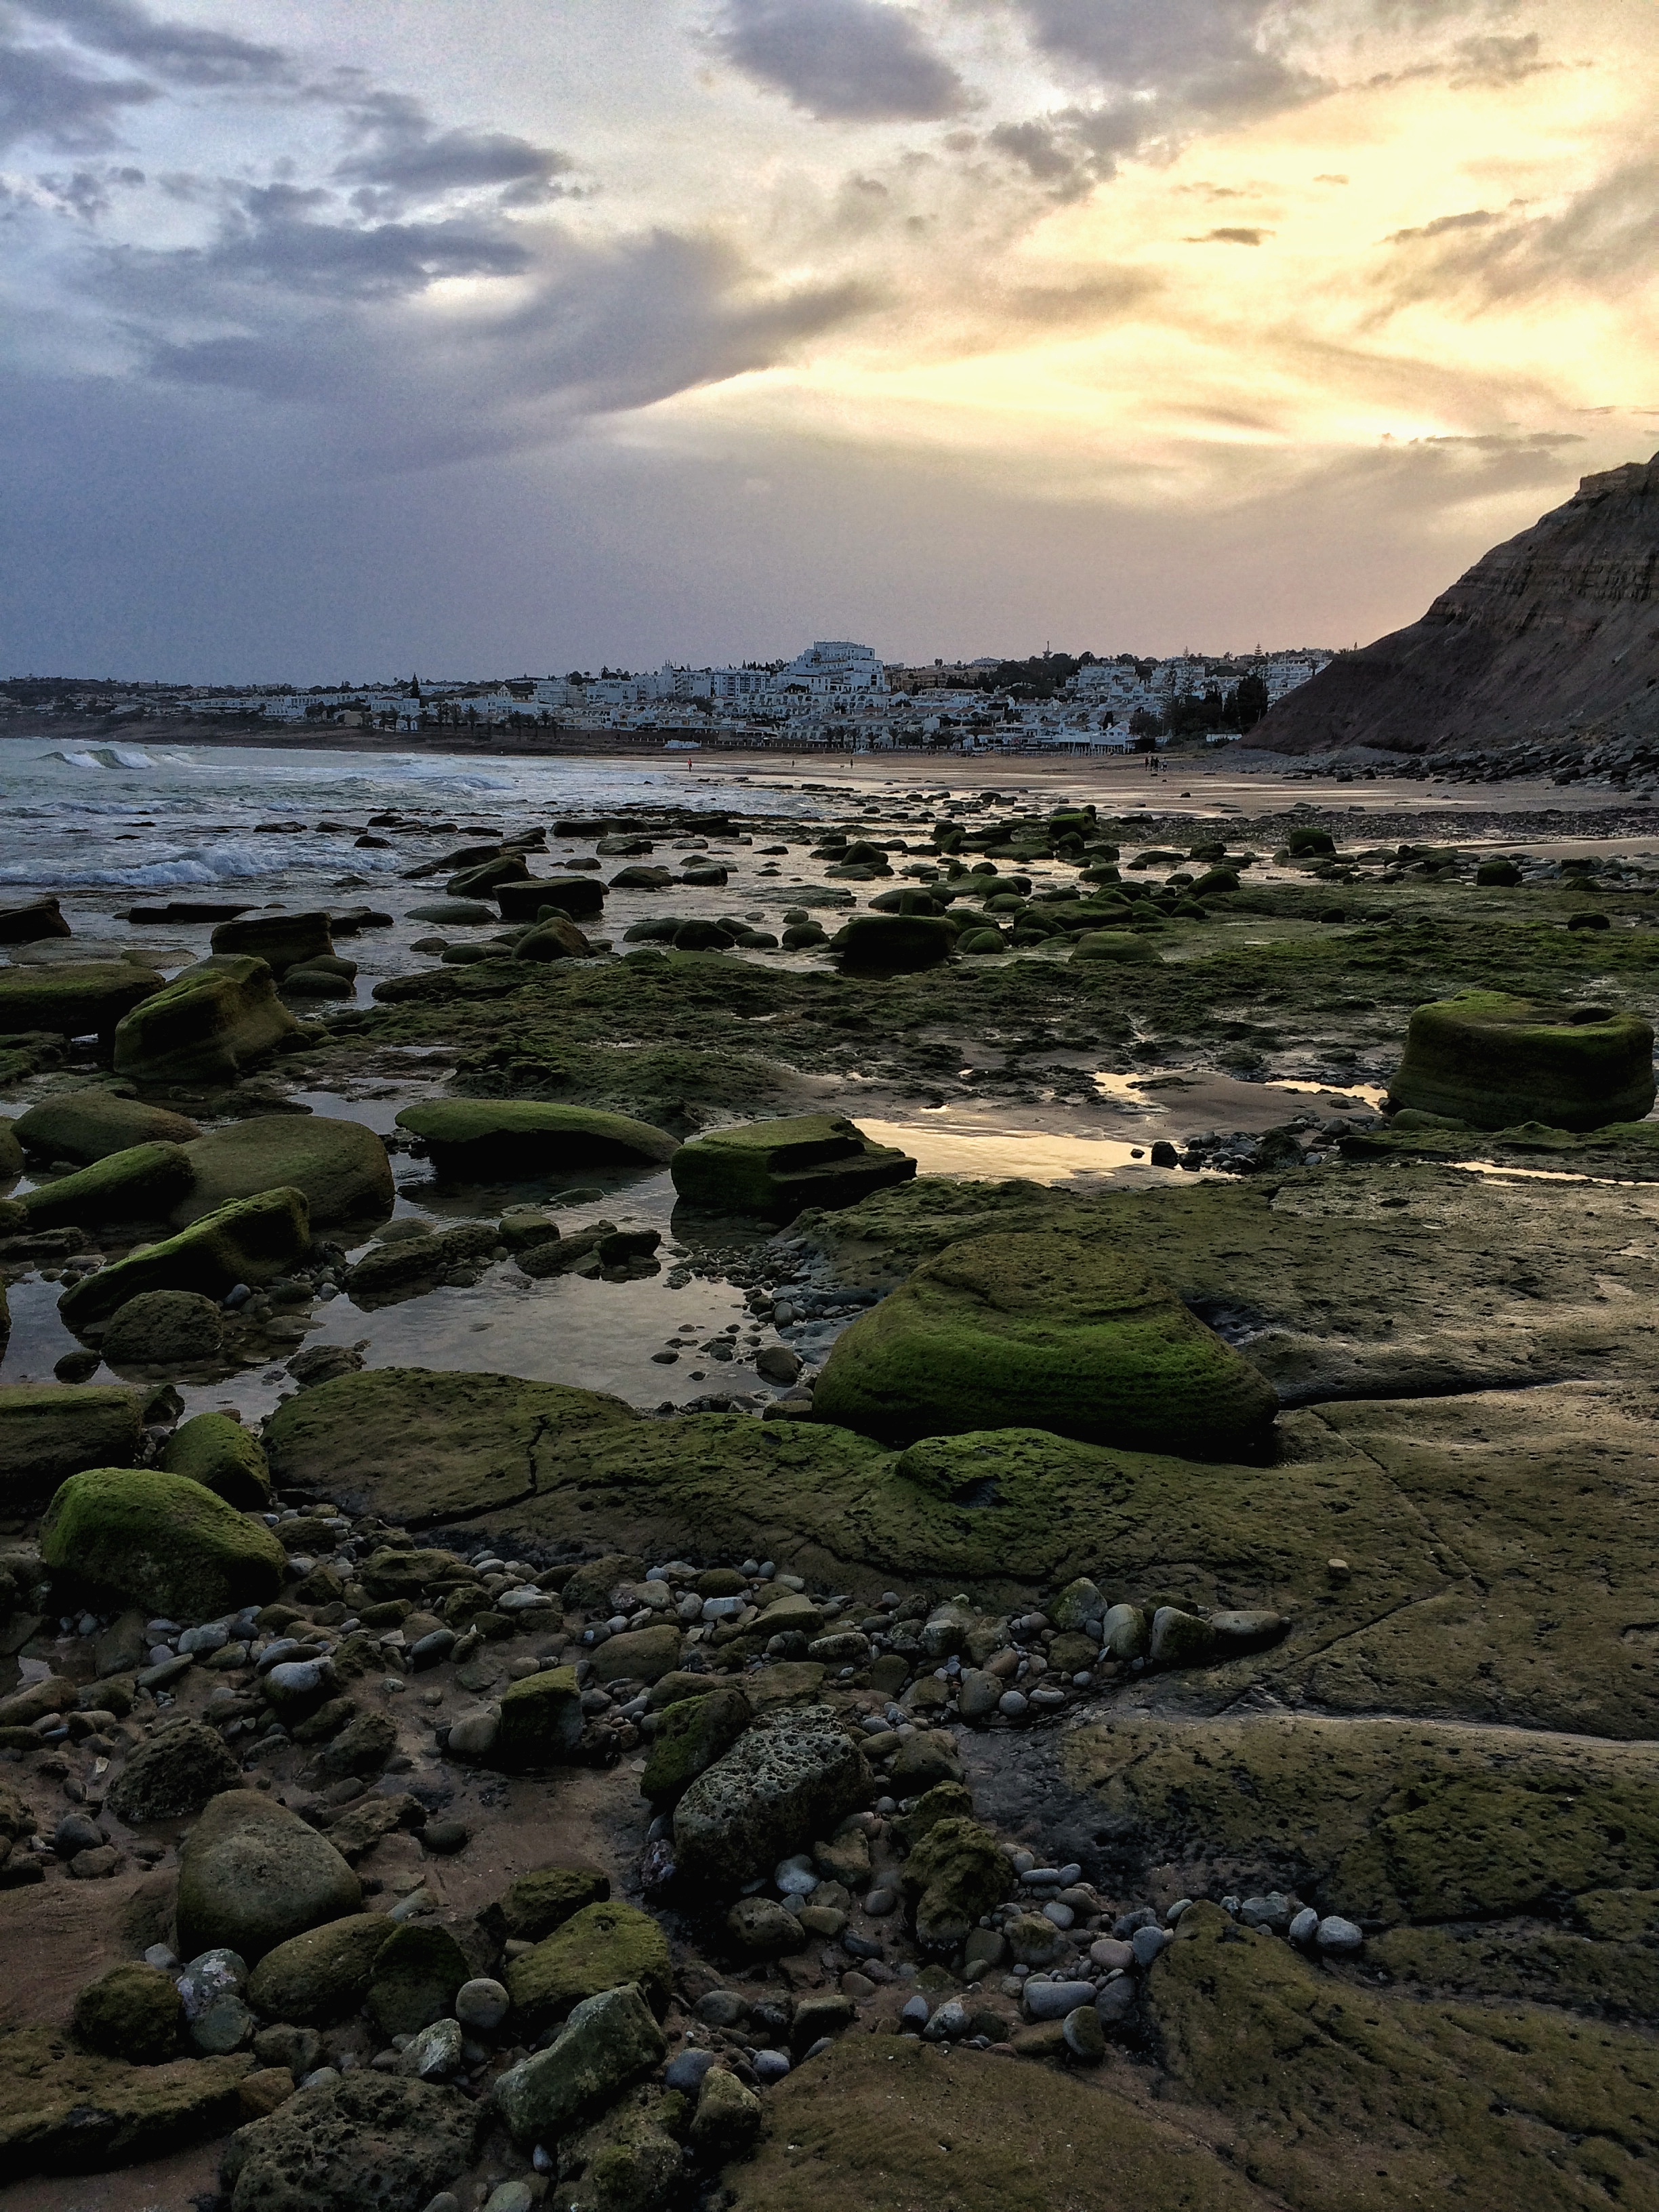 Sonnenuntergang bei Luz an der Algarve - Portugal